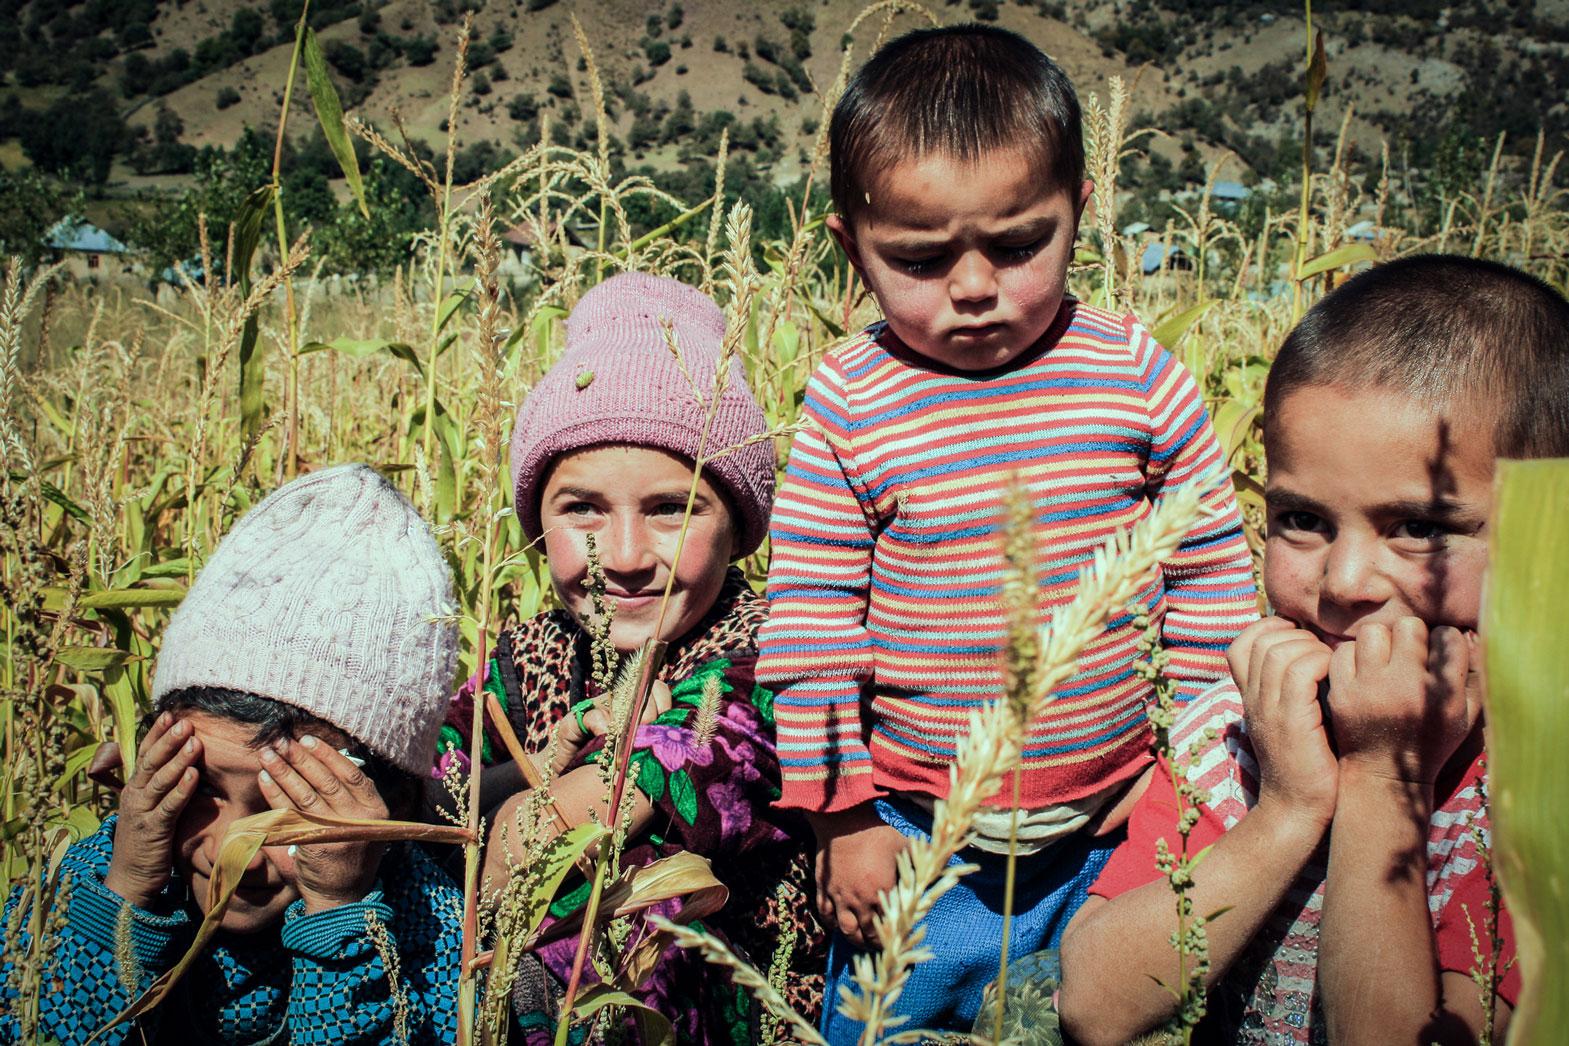 Kids in Arslanbob, Kyrgyzstan.